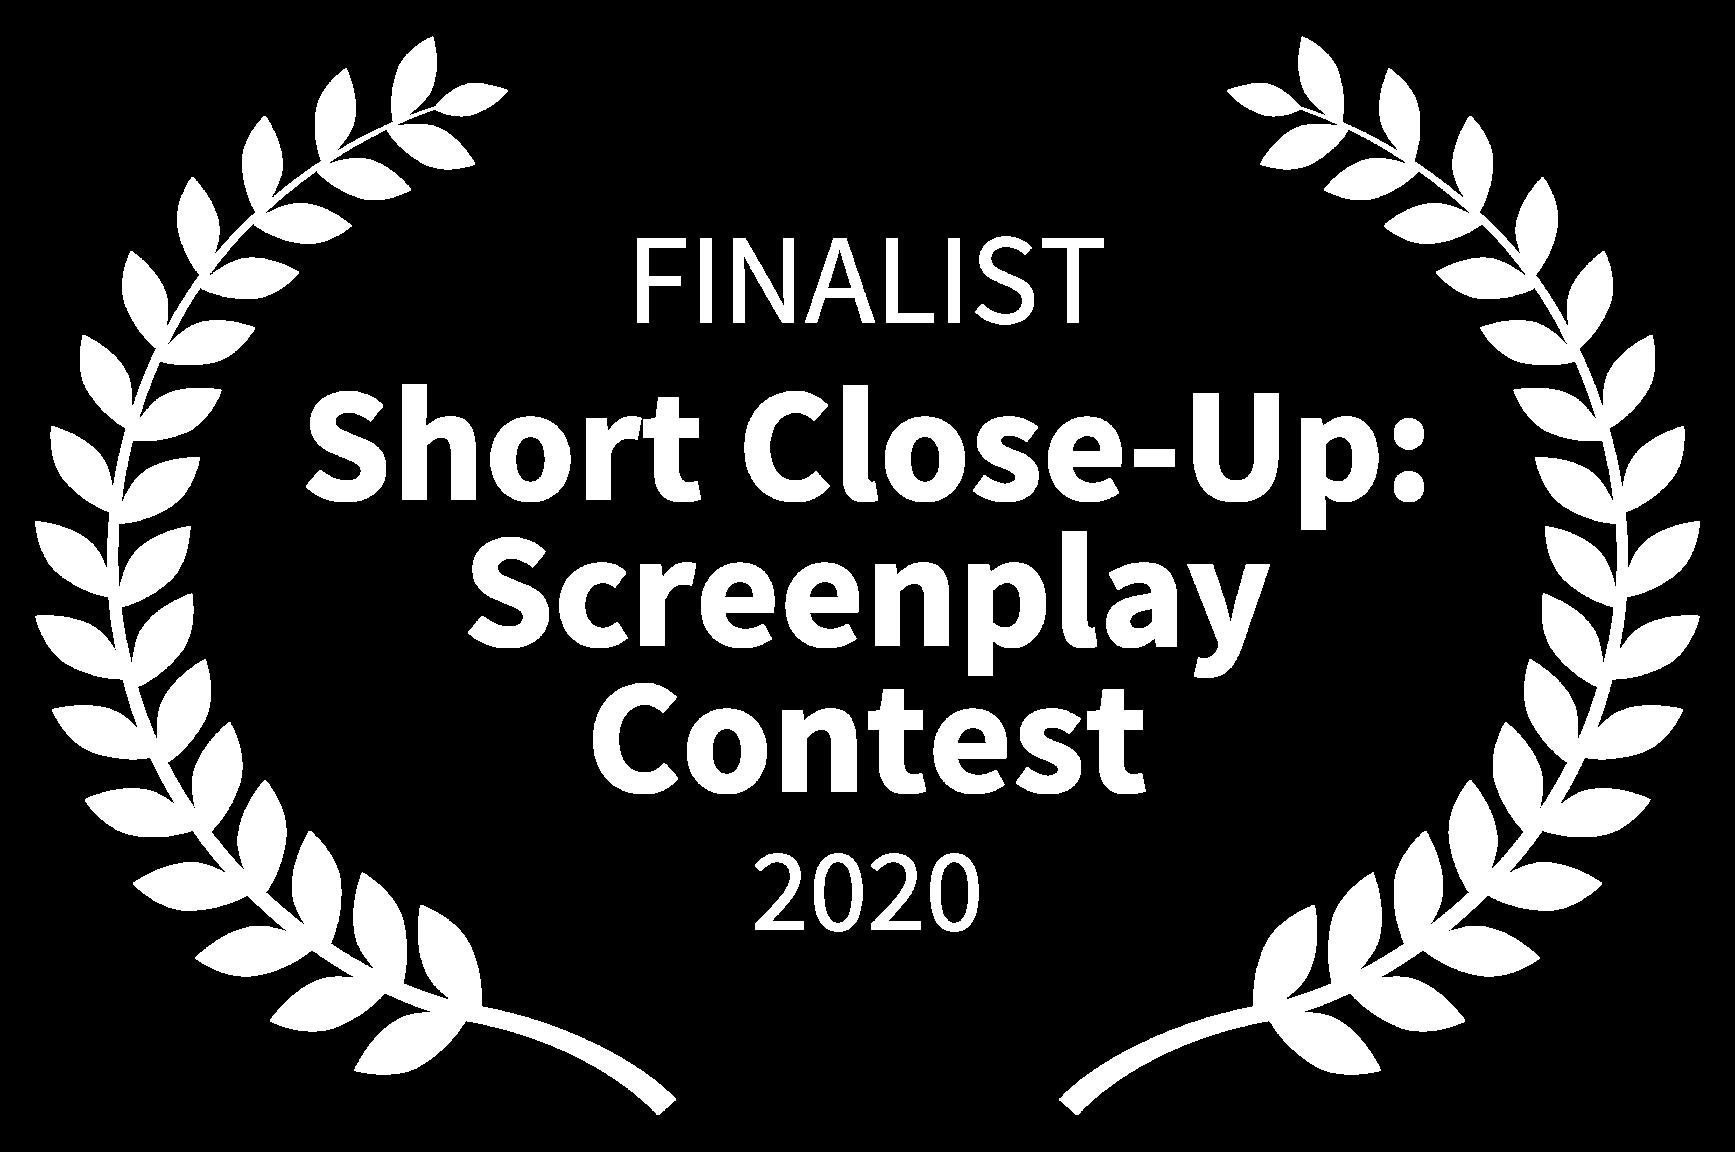 FINALIST - Short Close-Up Screenplay Contest - 2020